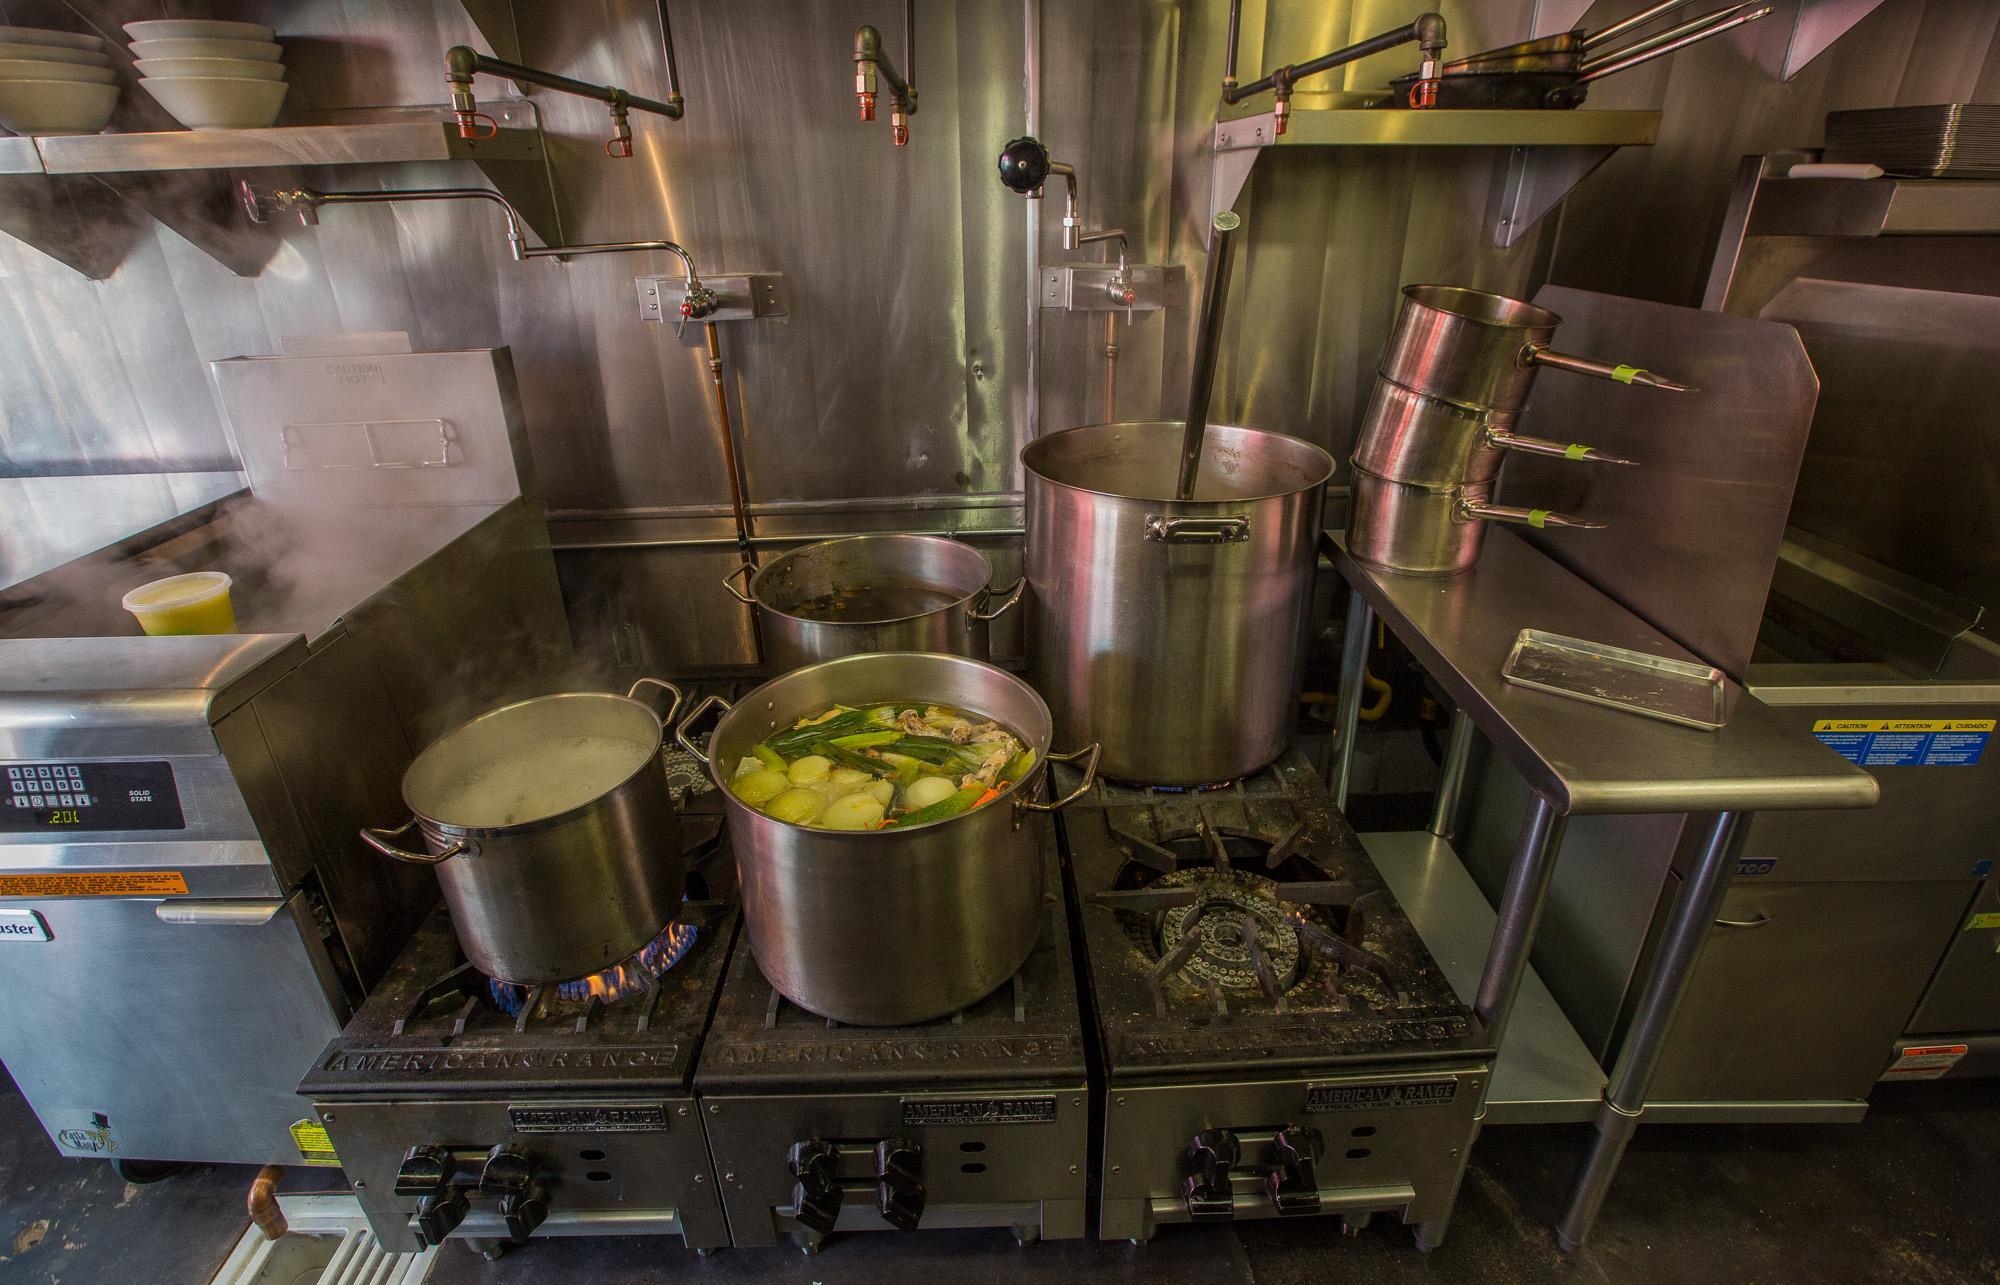 The stoves at Ramen Champ